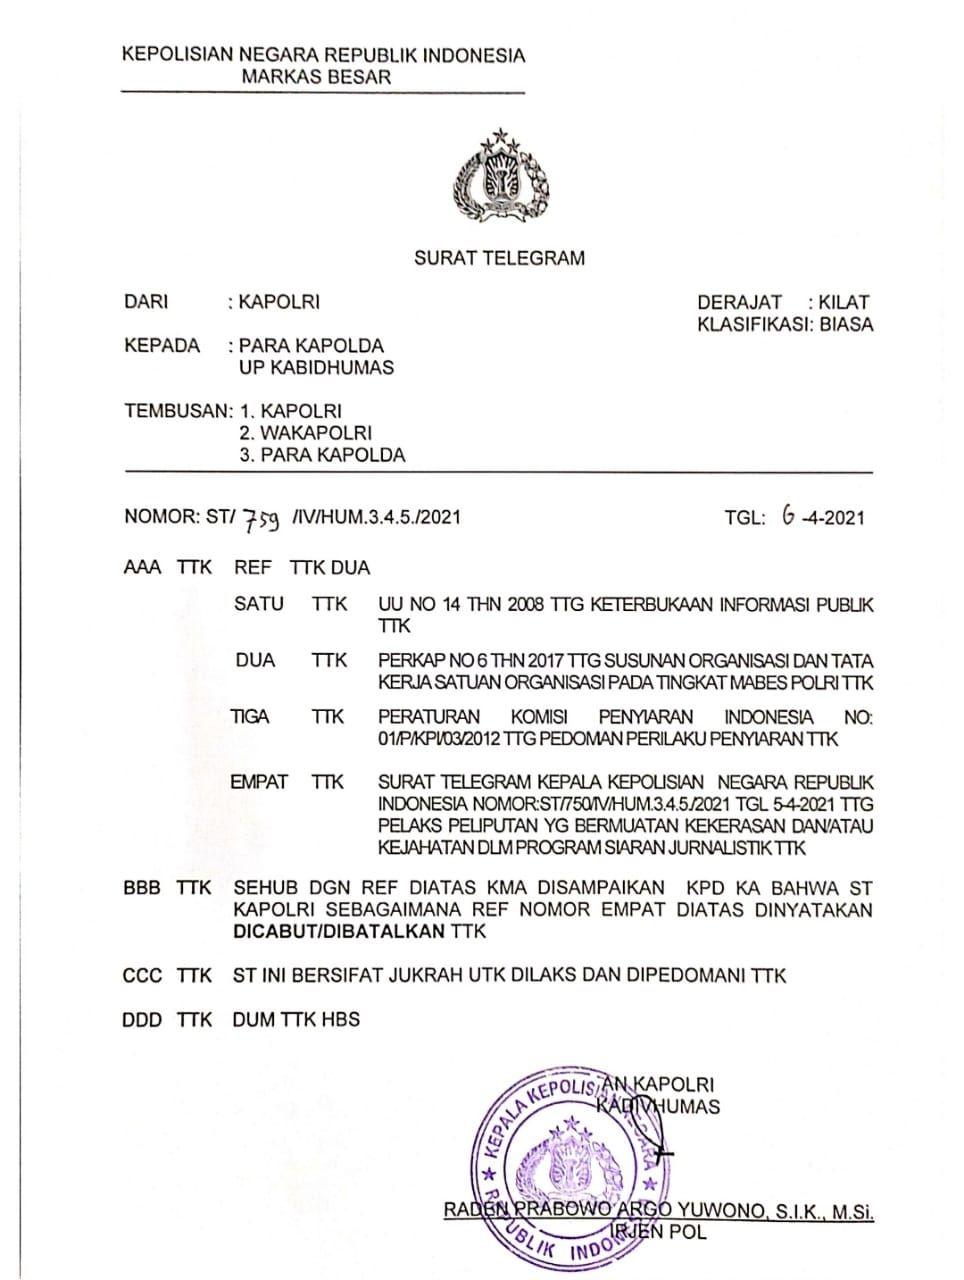 Surat telegram Kapolri